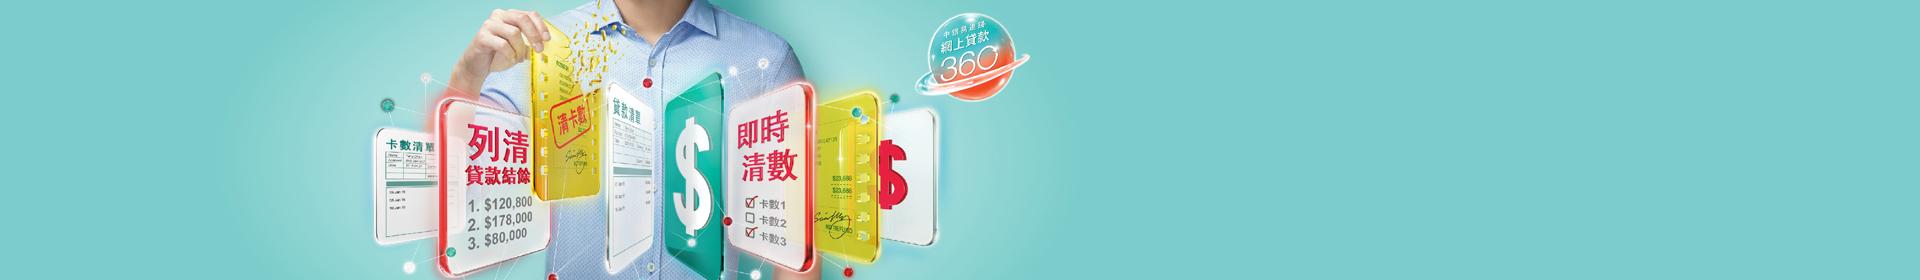 BOC Express Cash Instalment Loan Balance Transfer | Loan | Bank of ...